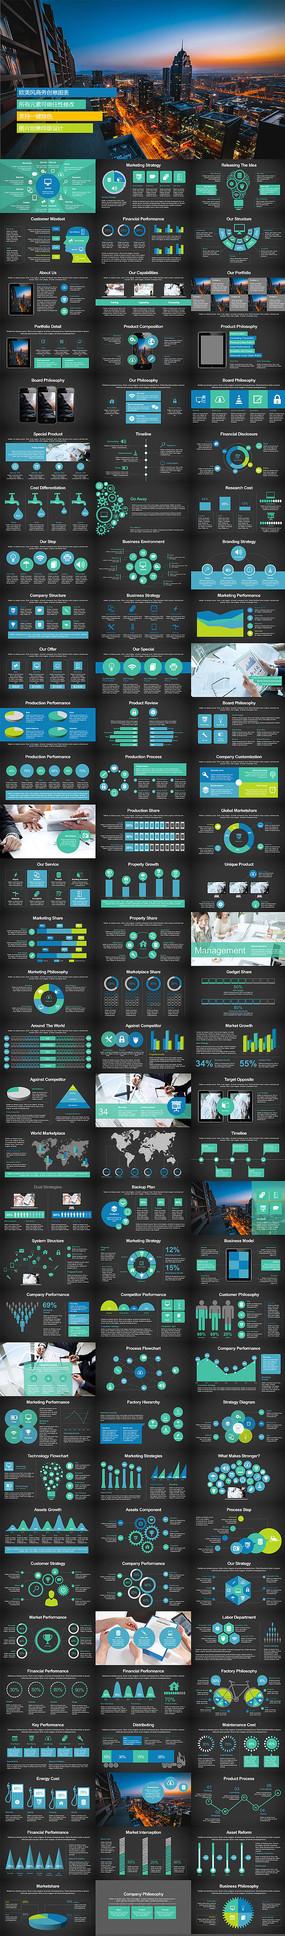 PPT图文排版设计相册排版人物介绍简历PPT图表下载 pptx